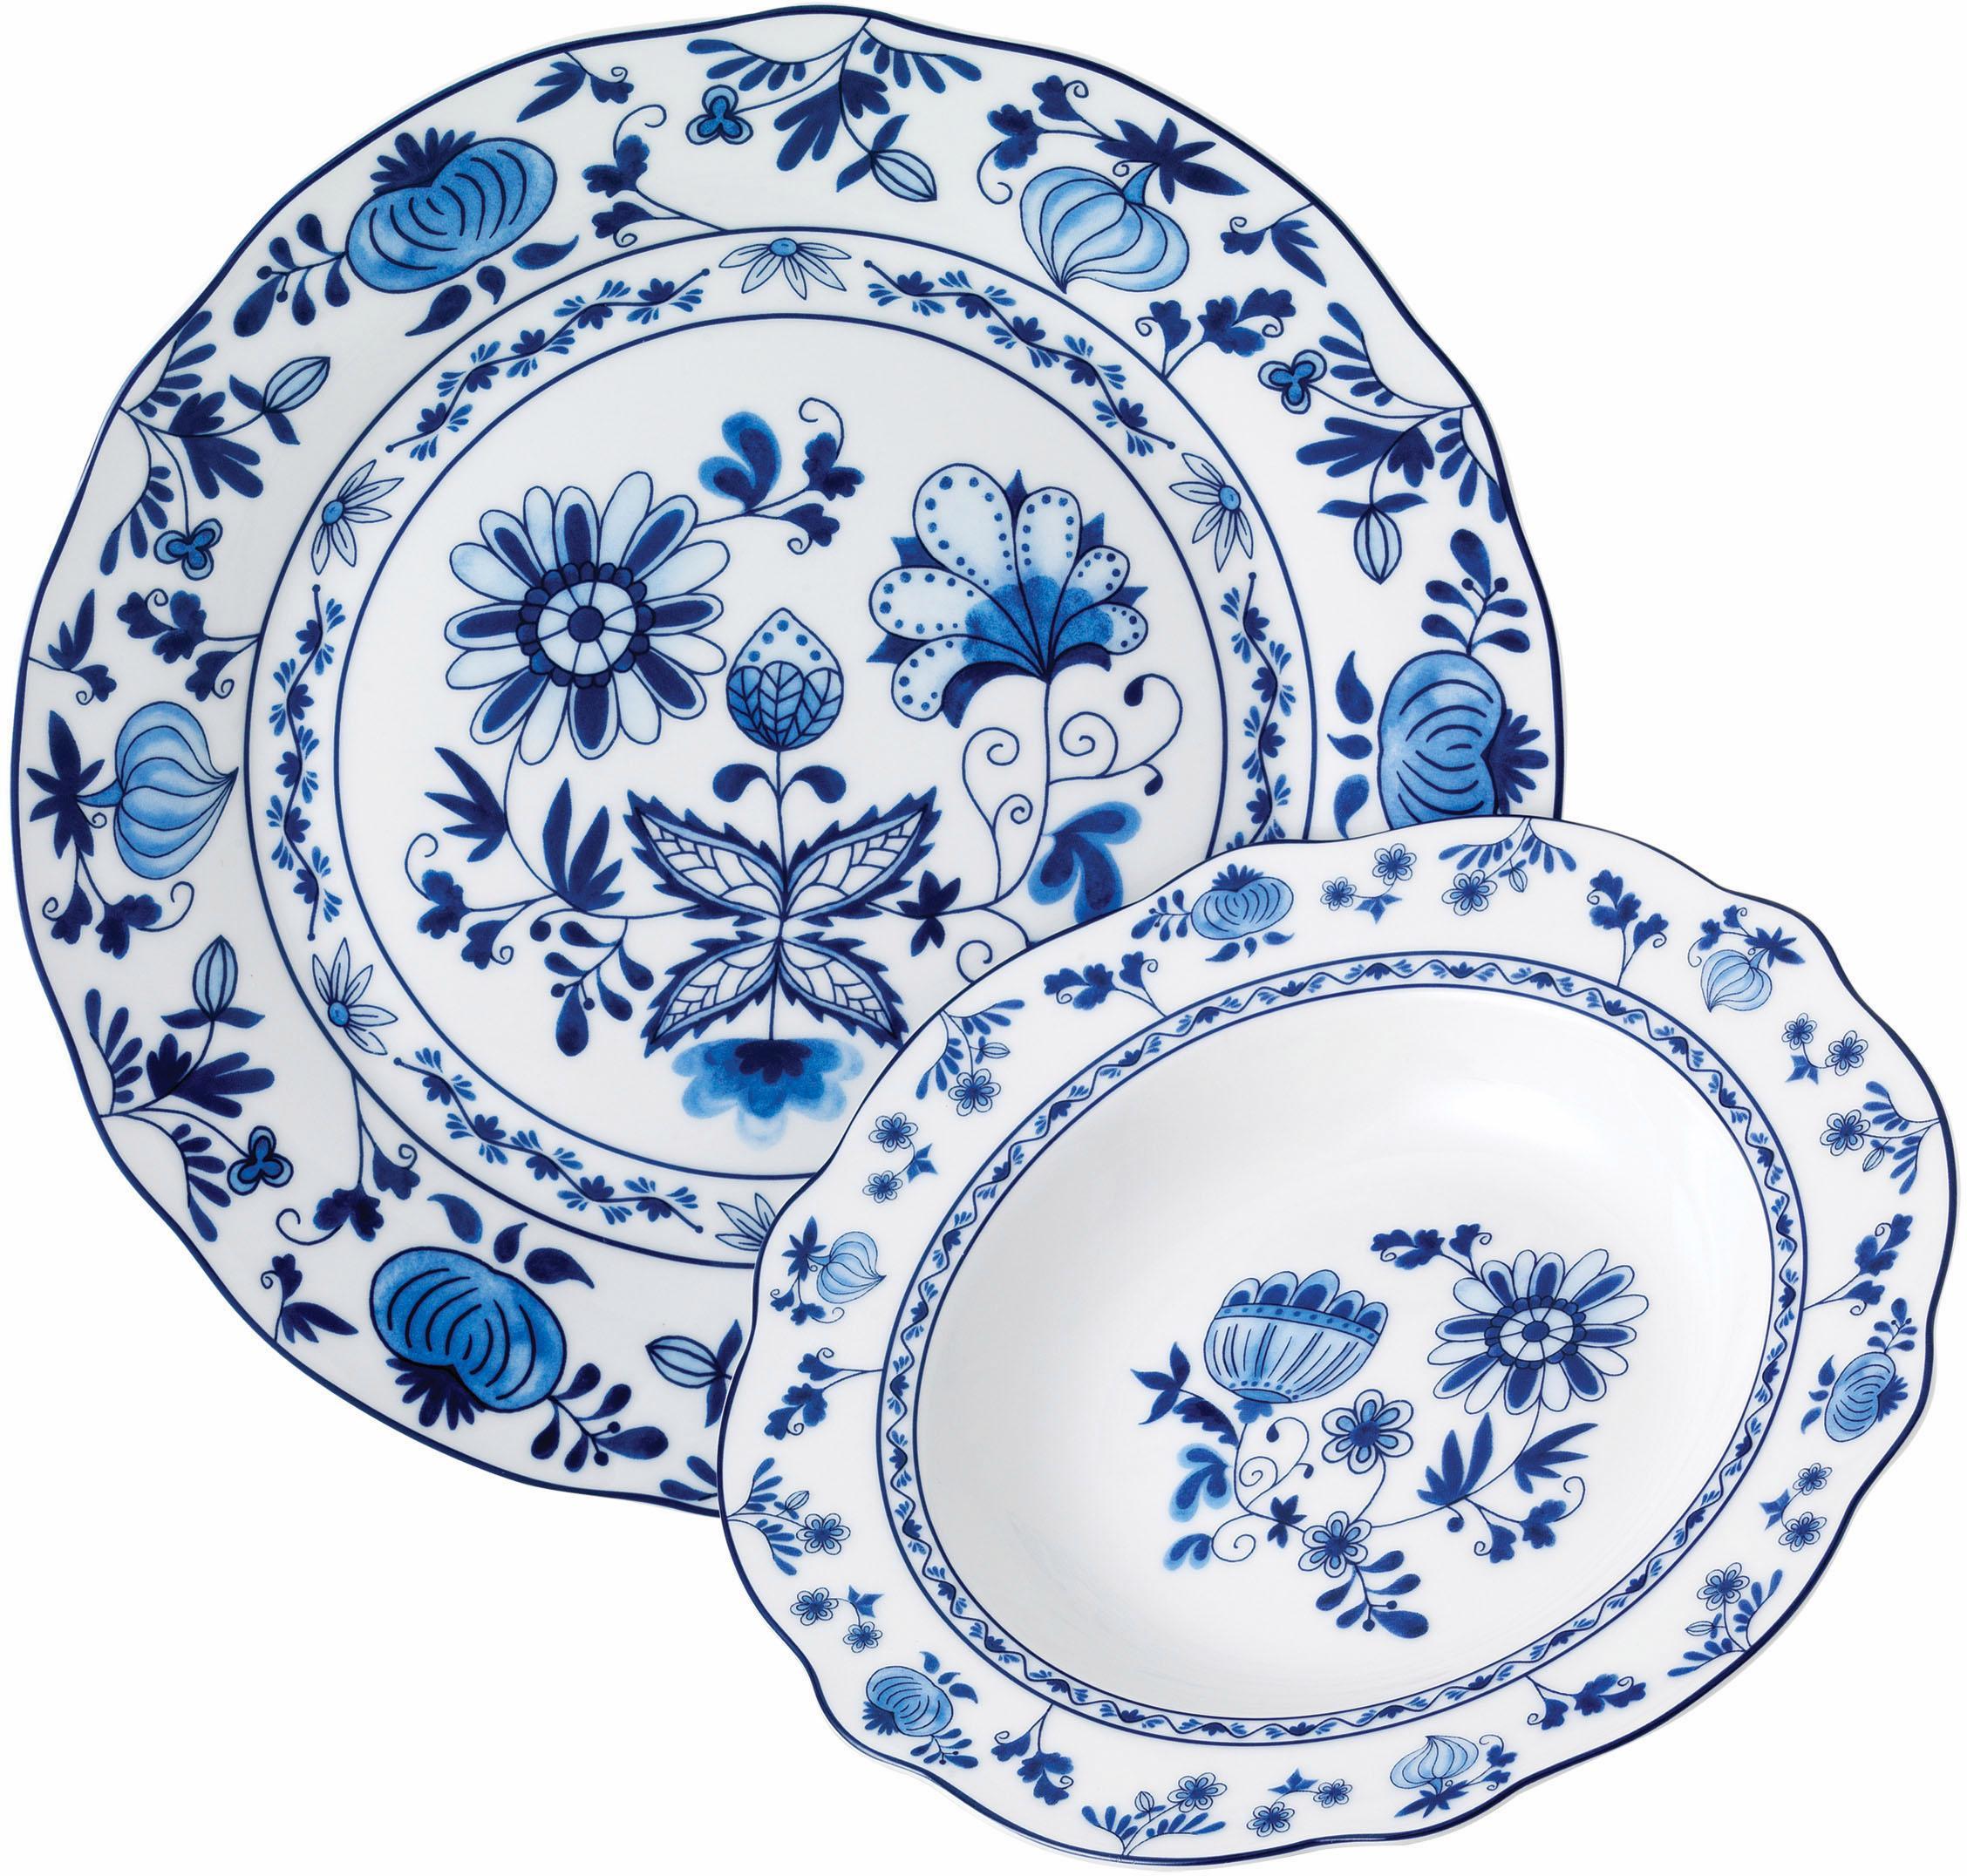 van Well Tafelservice ZWIEBELMUSTER (12-tlg.), Porzellan weiß Geschirr-Sets Geschirr, Tischaccessoires Haushaltswaren